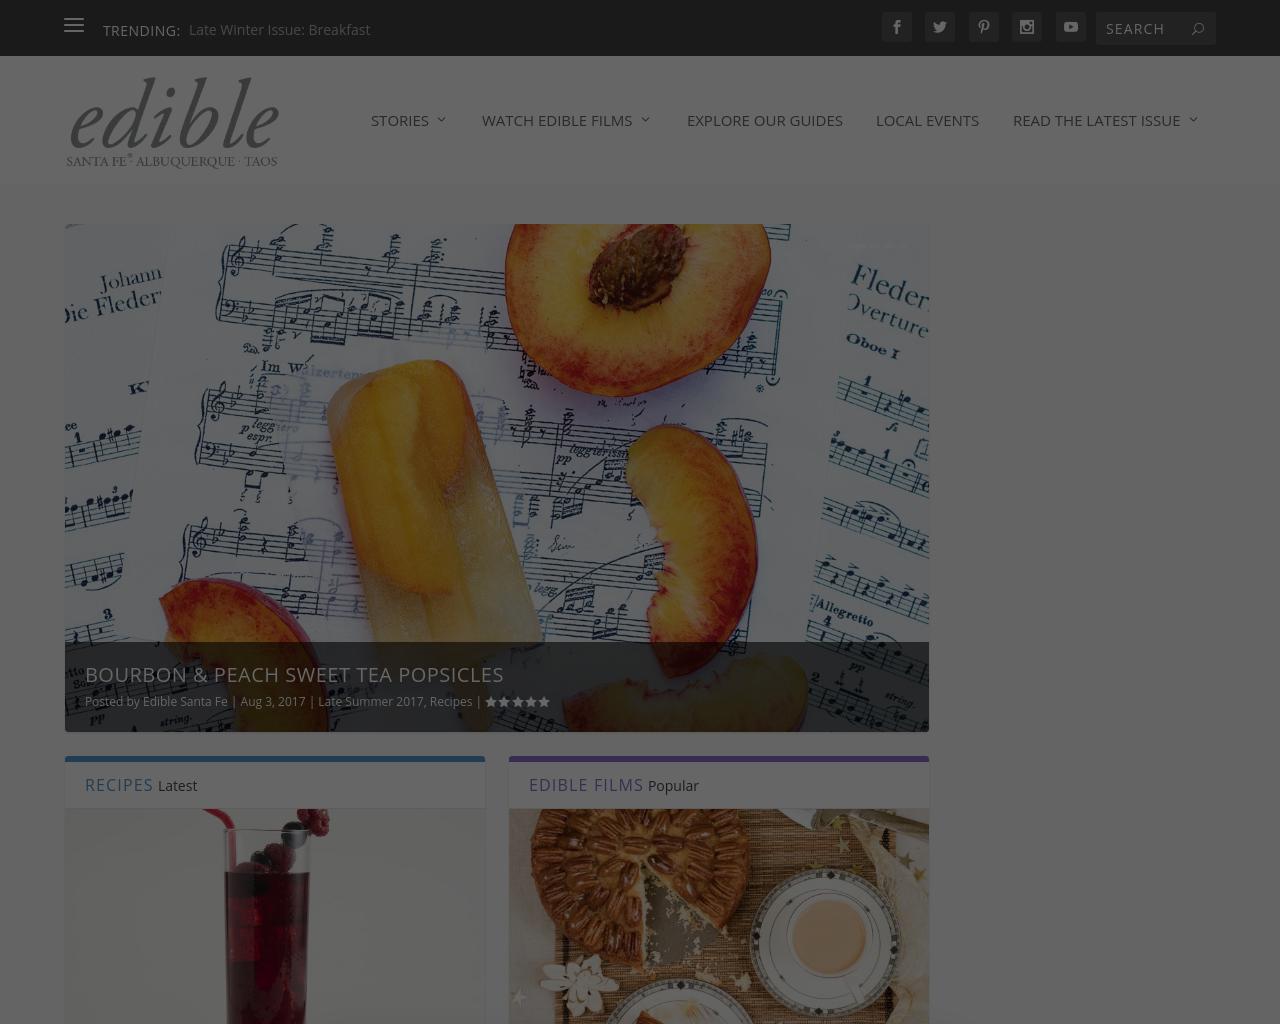 Edible-Santa-Fe-Advertising-Reviews-Pricing